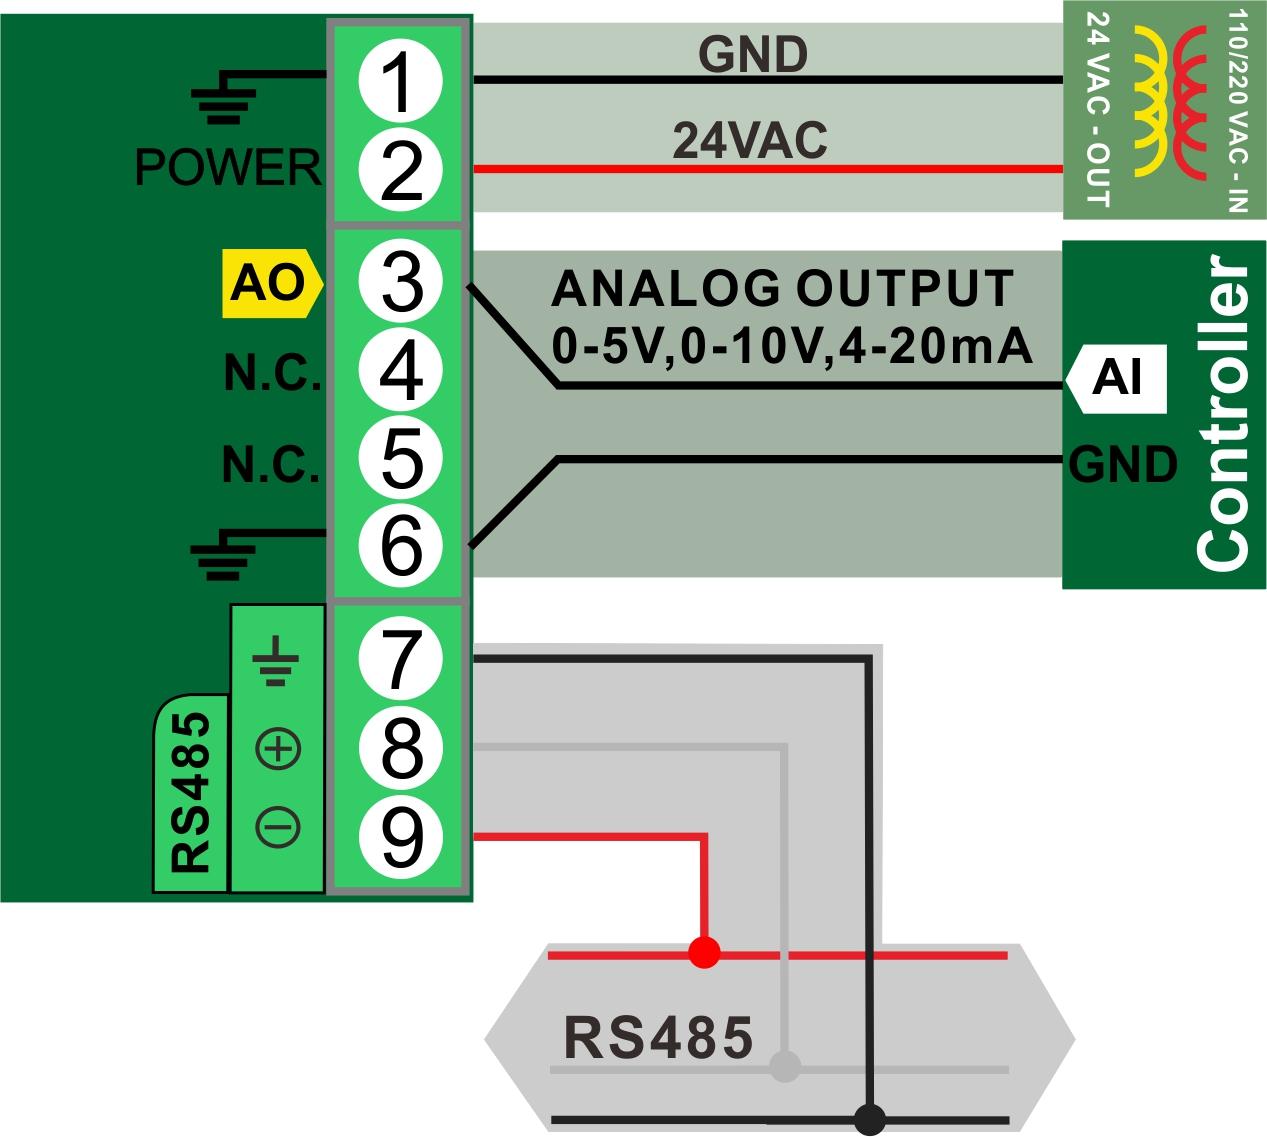 hight resolution of pressure sensor bravo controls pressure wiring 2 pressure sensor bravo controls 4 20ma pressure transducer wiring diagram at cita